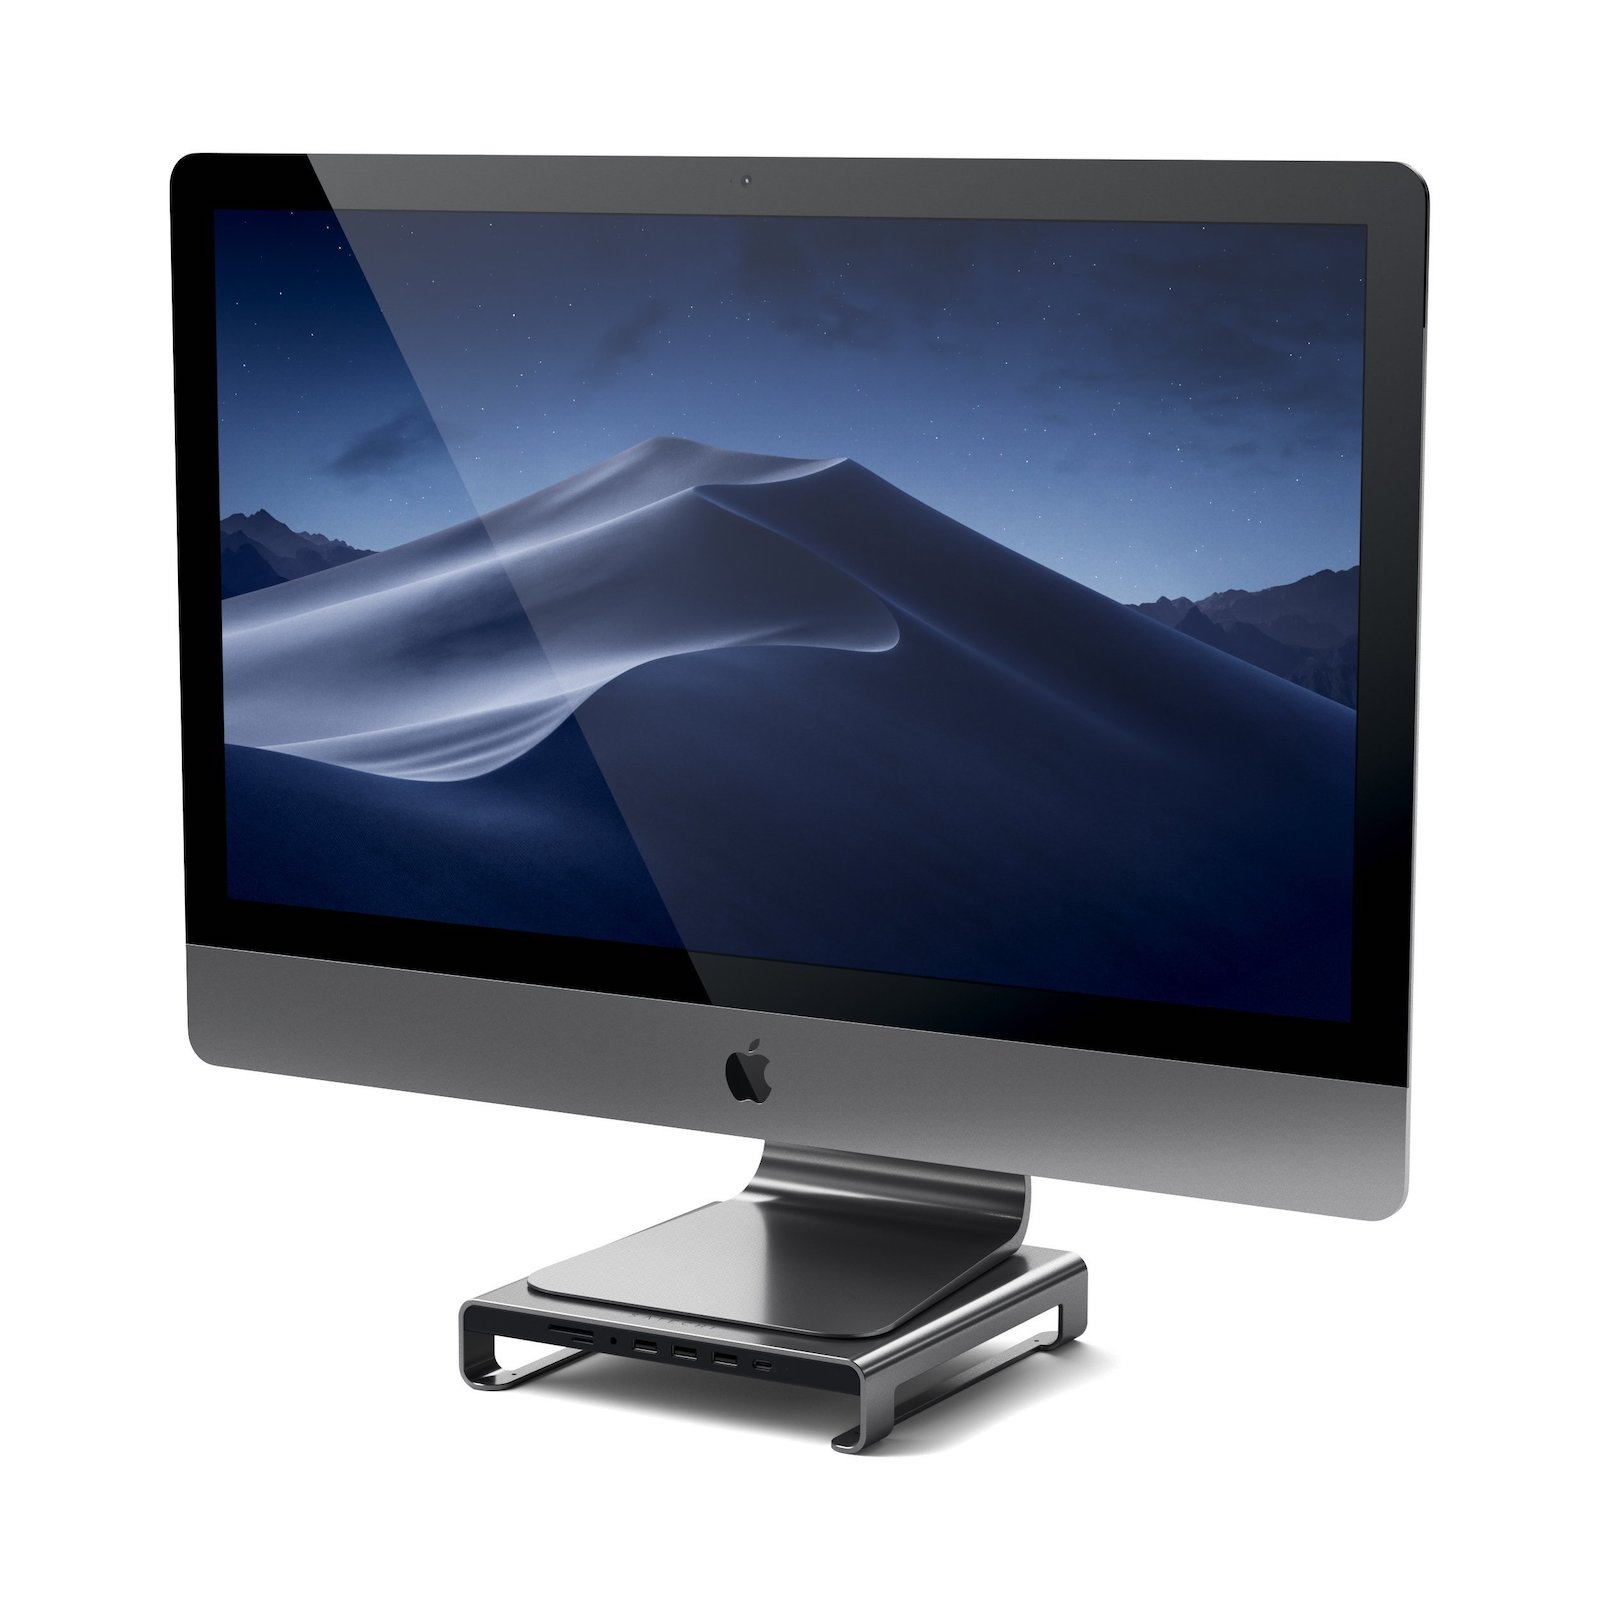 SATECHI_iMac_Stand_SPACEGRAY_9.jpg